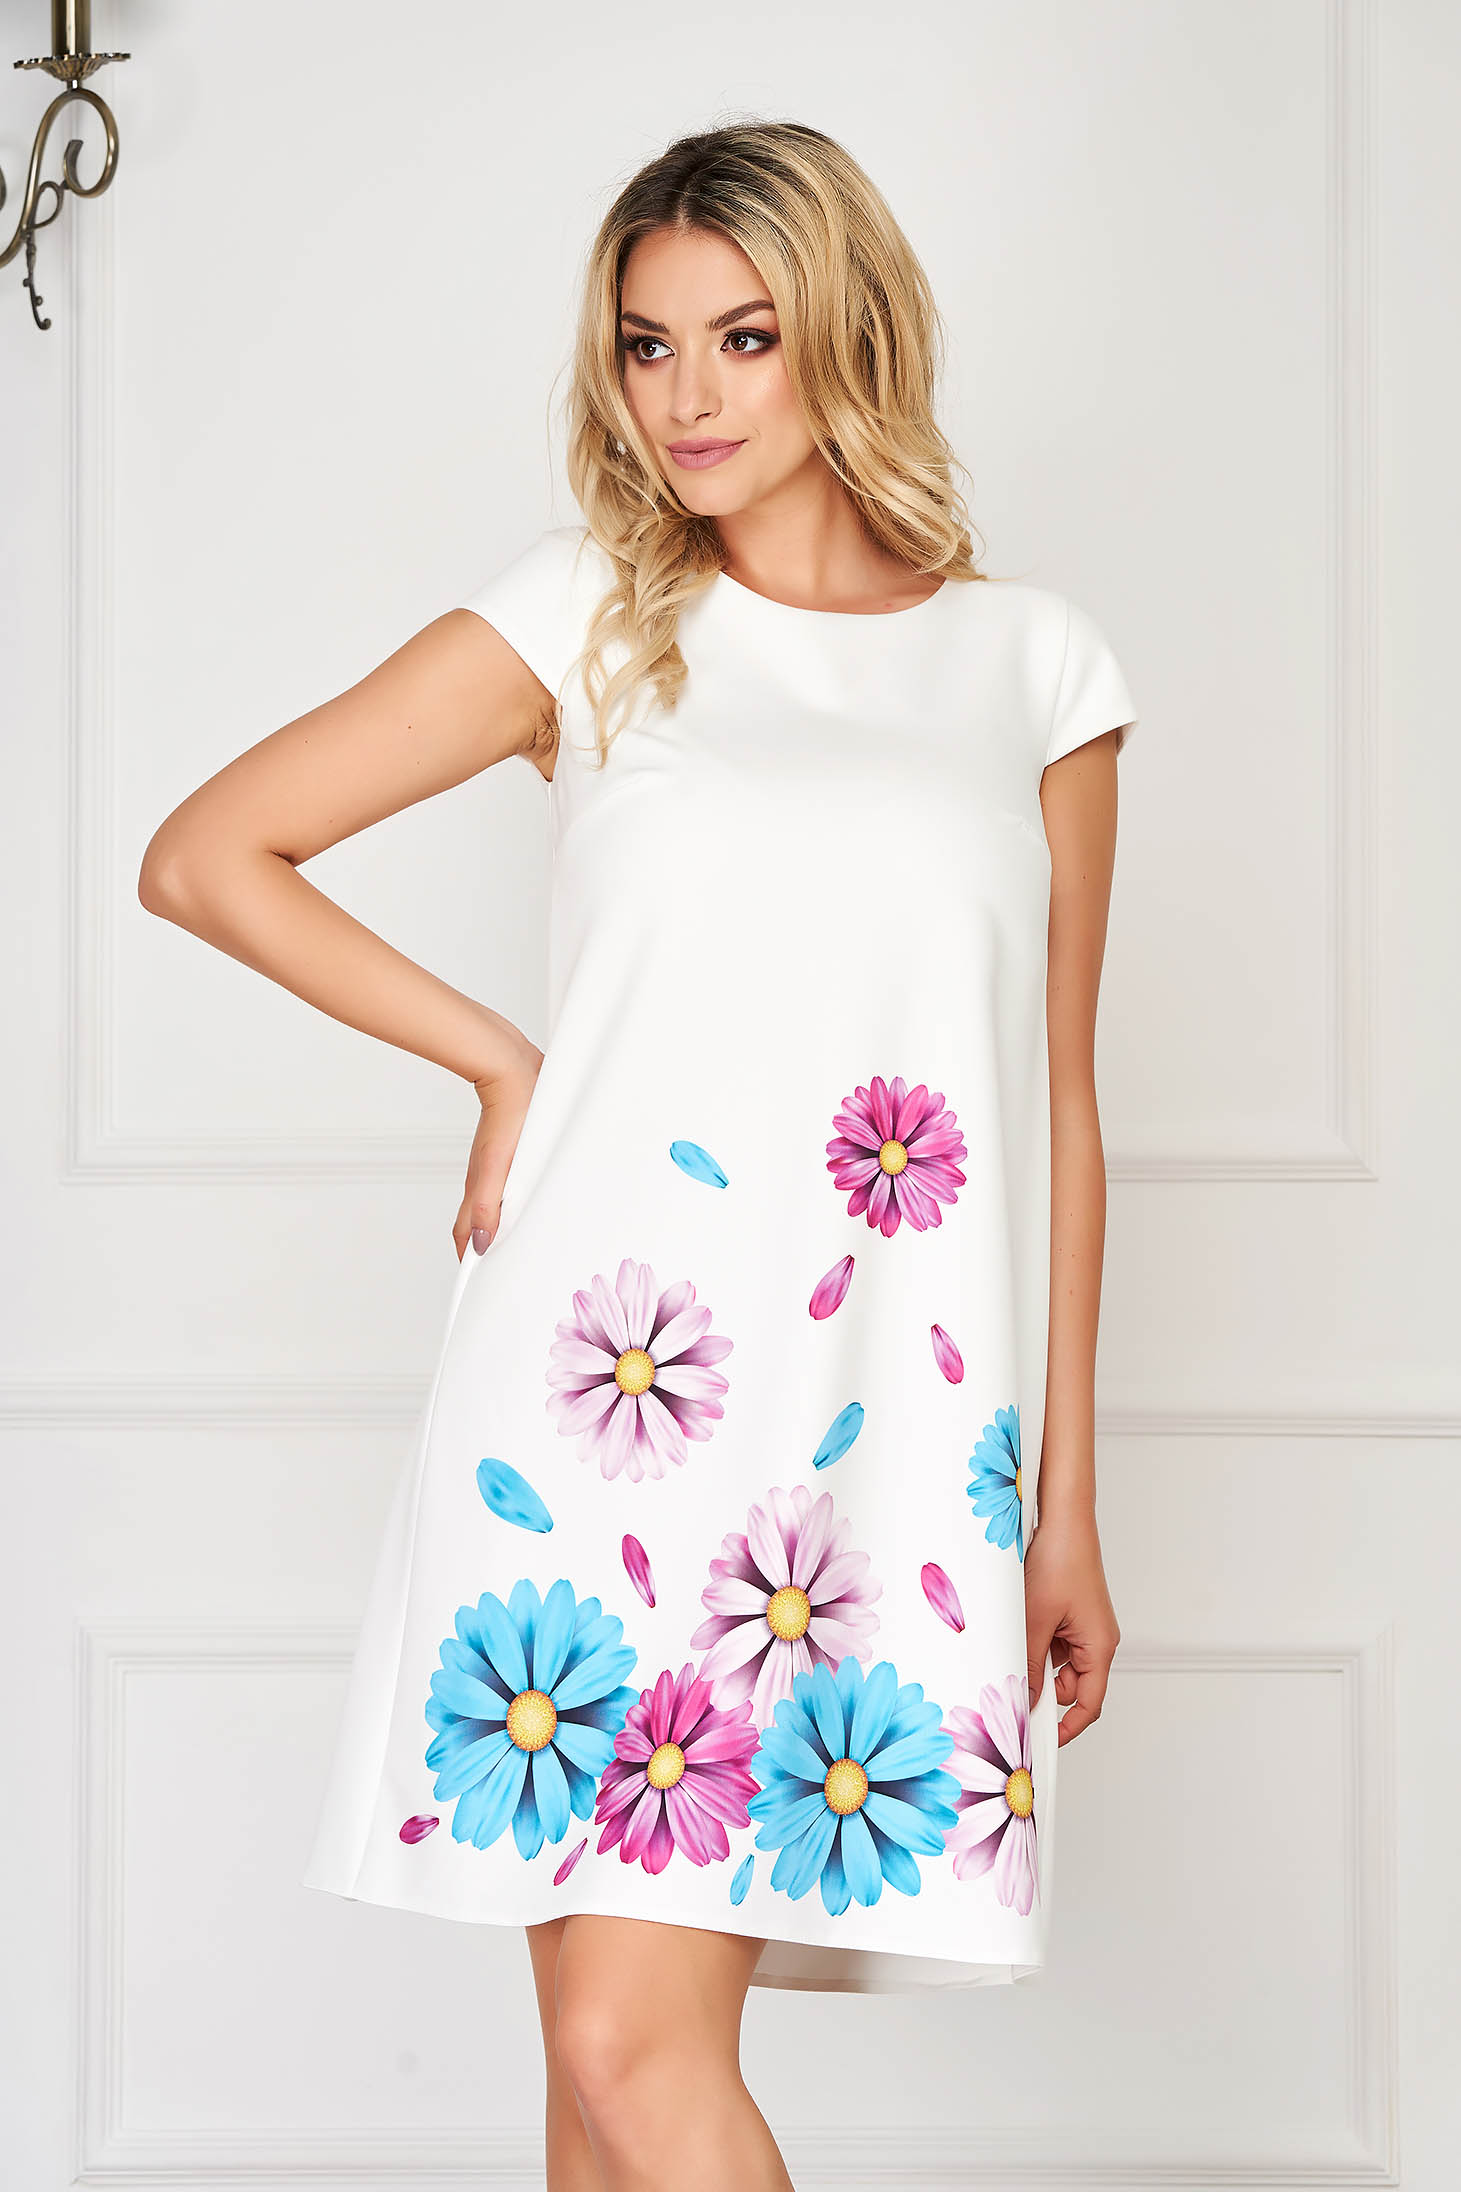 Dress StarShinerS lightblue elegant short cut cloth slightly elastic fabric with floral print